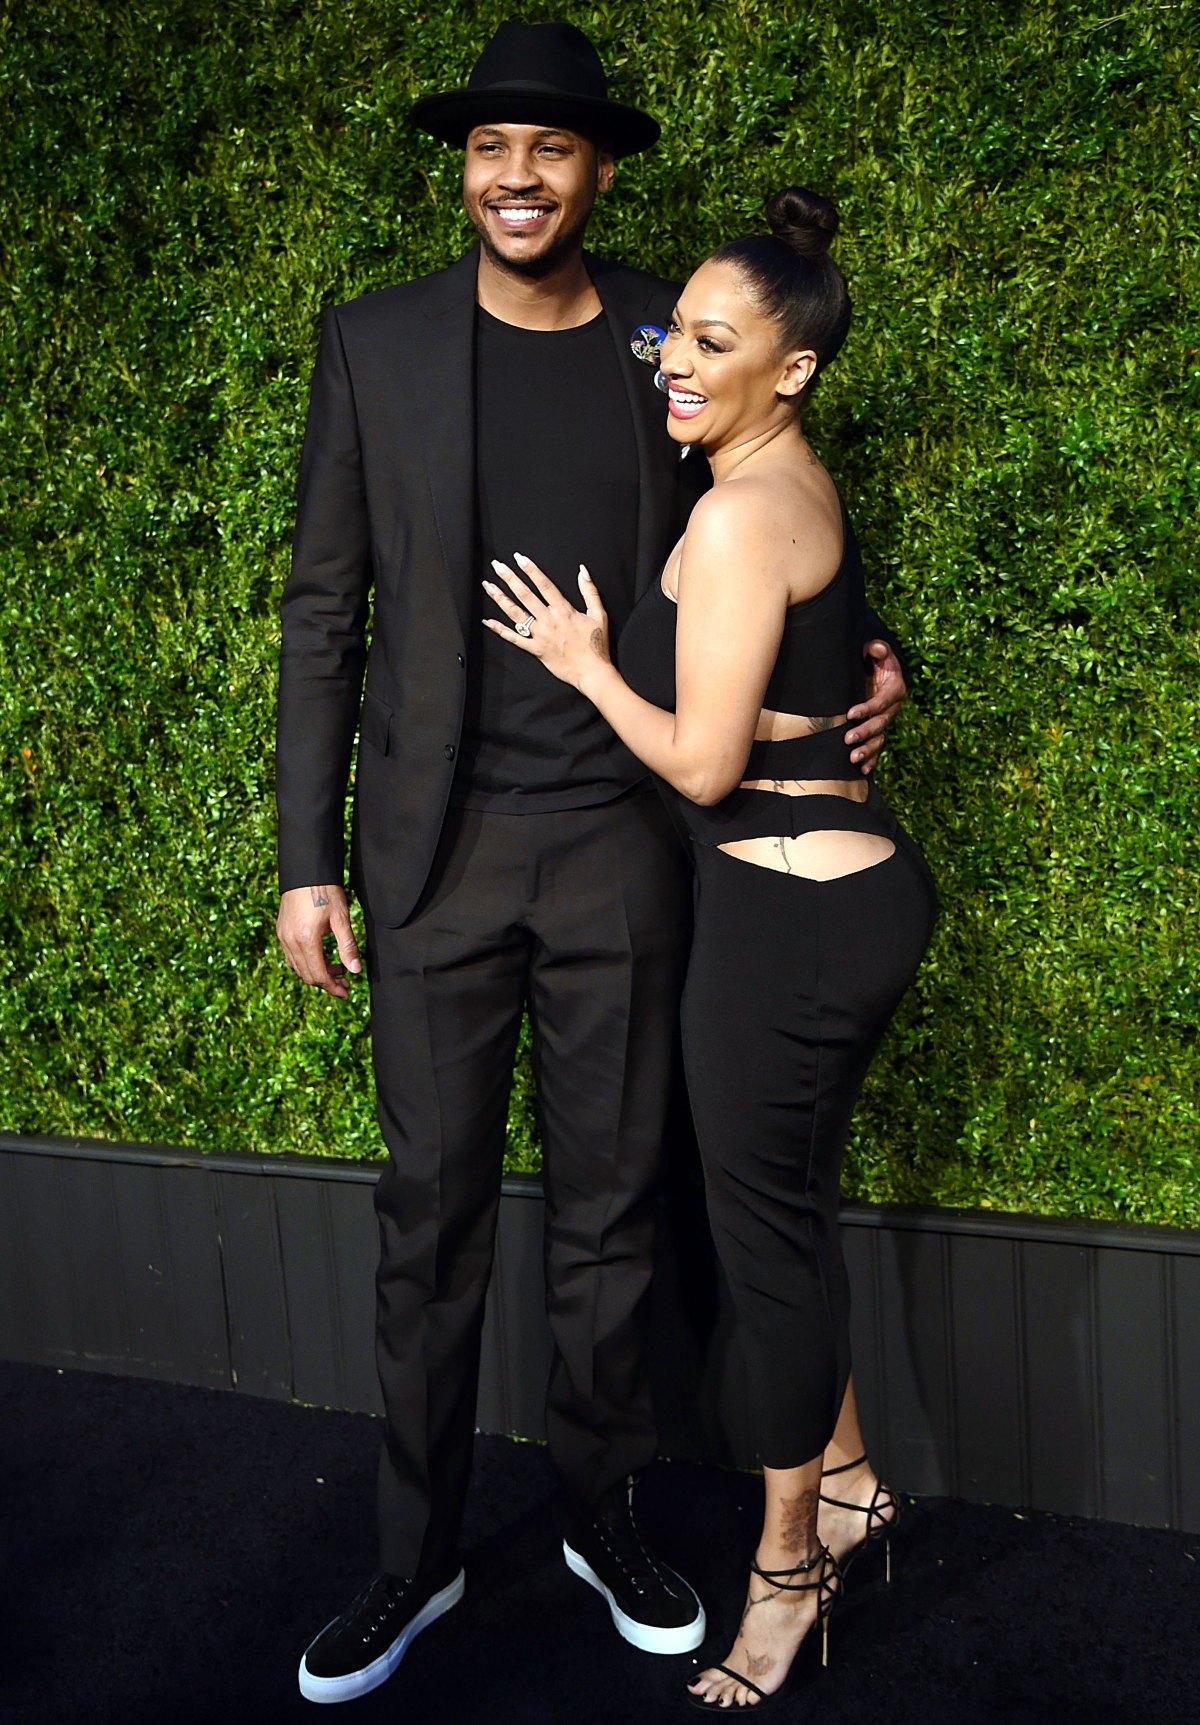 La La Anthony Reveals She's Quarantining With Carmelo Anthony